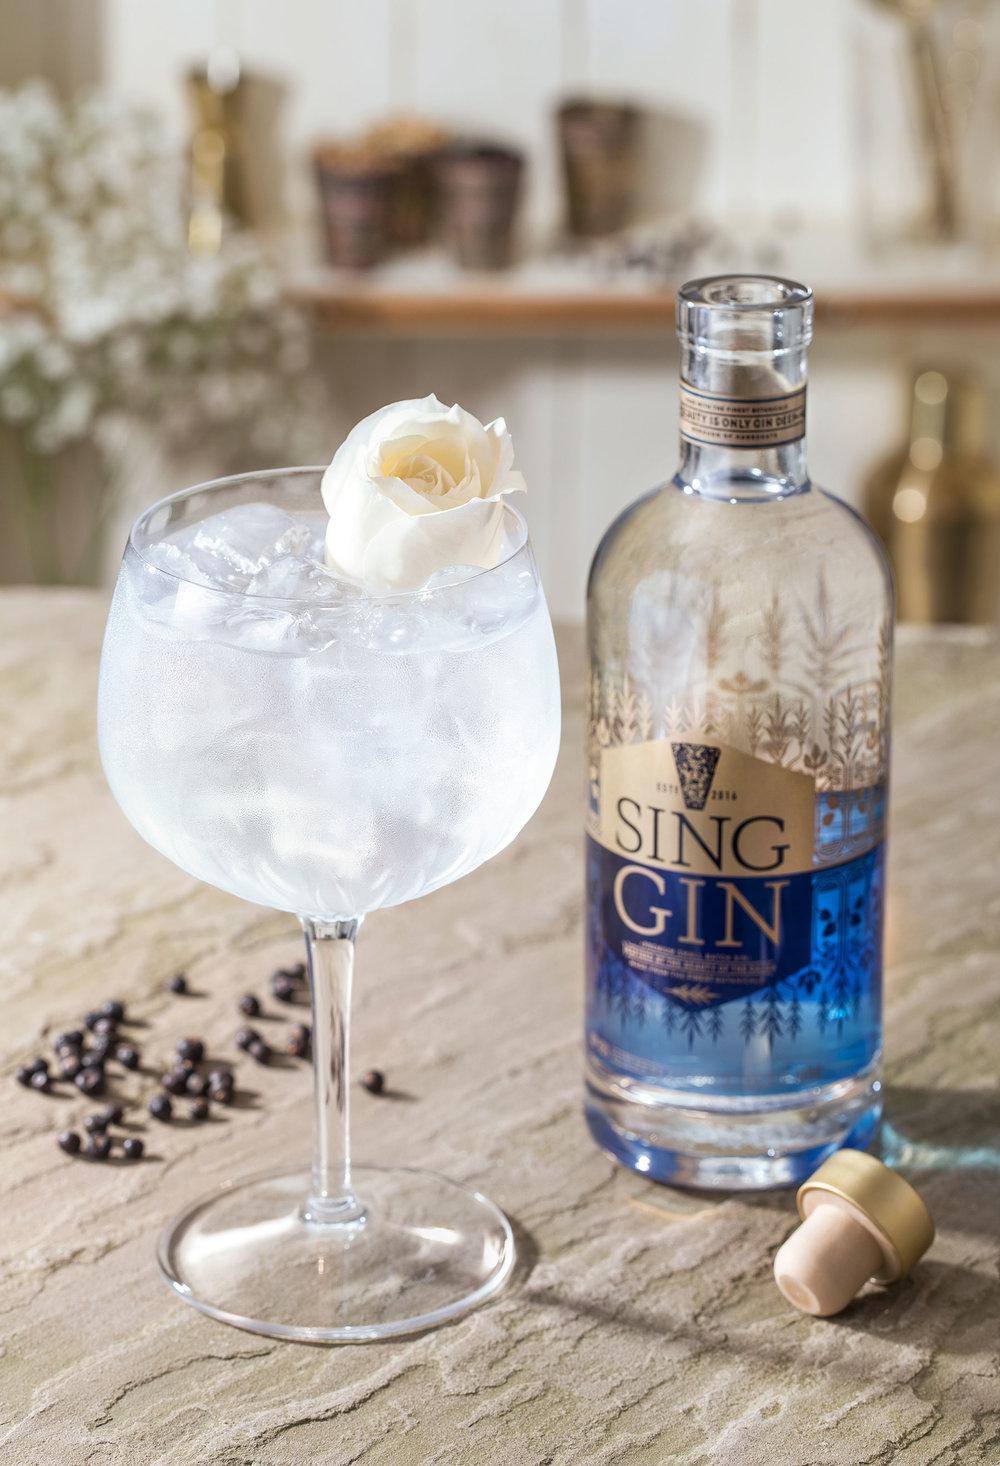 SG_lifestyle_gin1.jpg